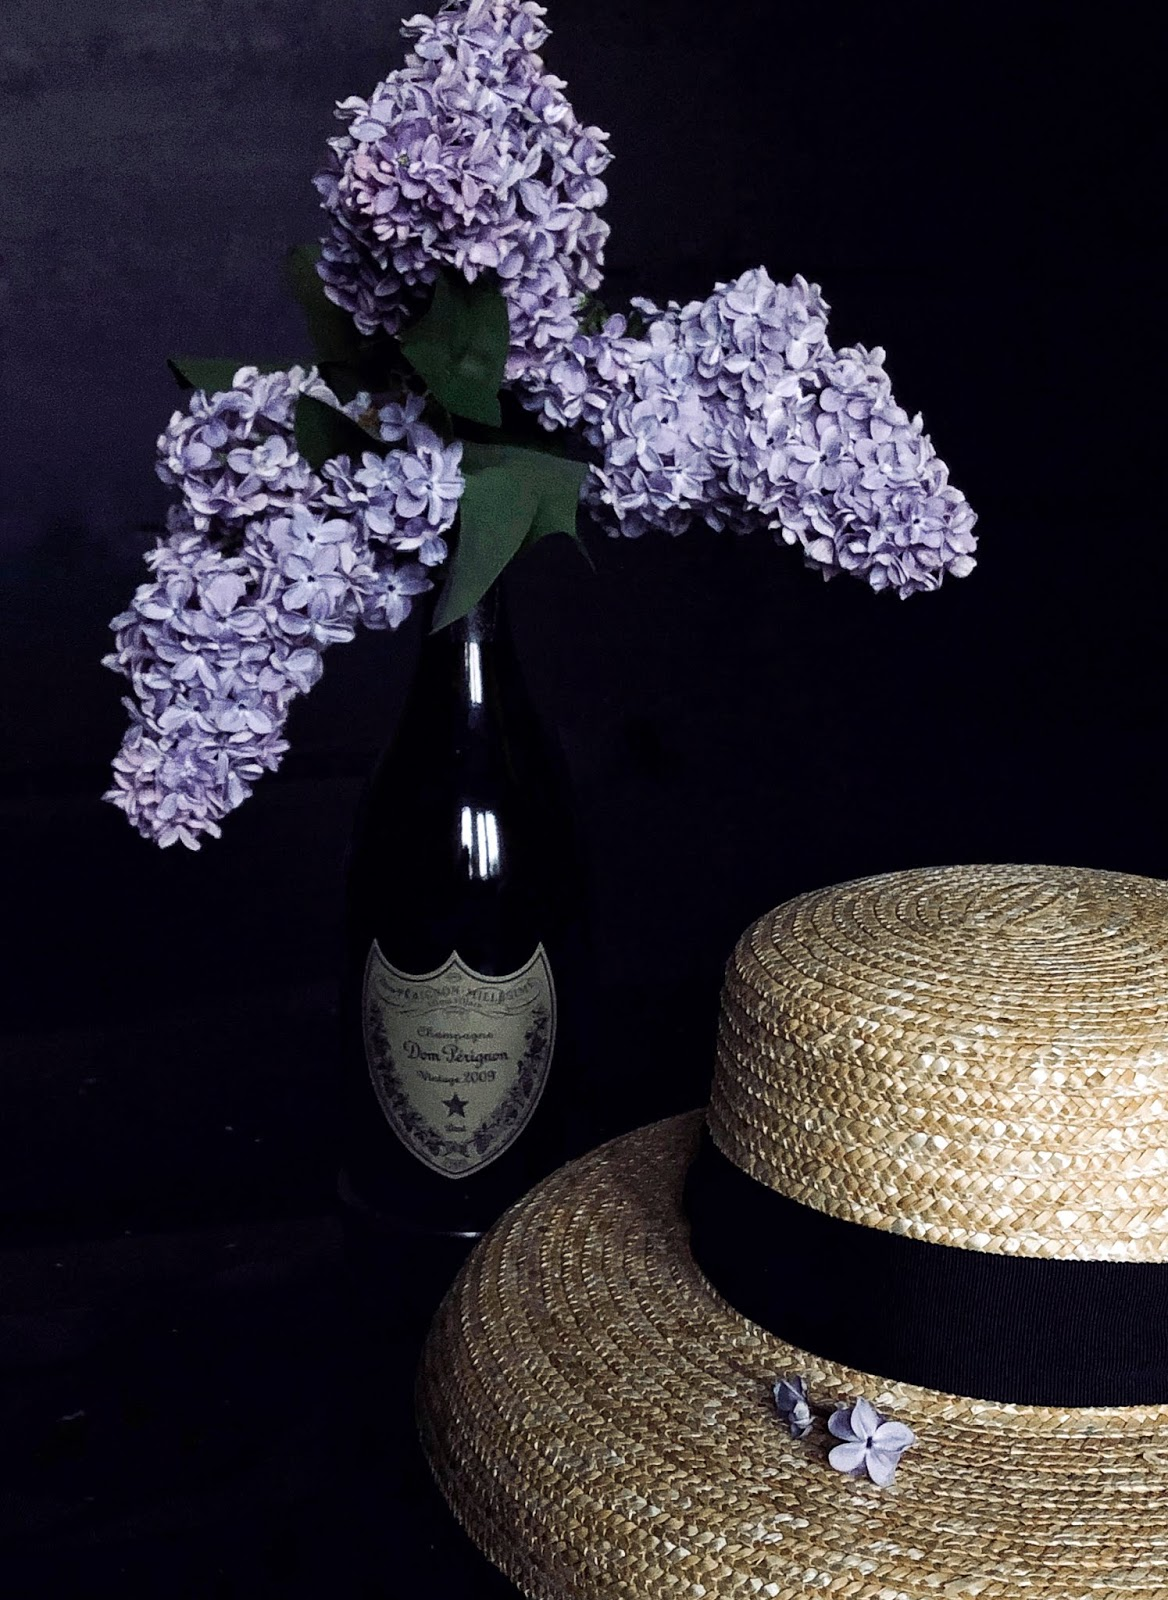 Lilac Sugar, Lilacs in Dom Perignon Vintage 2009 Bottle, missvoguevoyage, patricia petit, how to make lilac sugar, Lila sugar, floral sugar recipe, missvoguevoyage, Patricia Petit